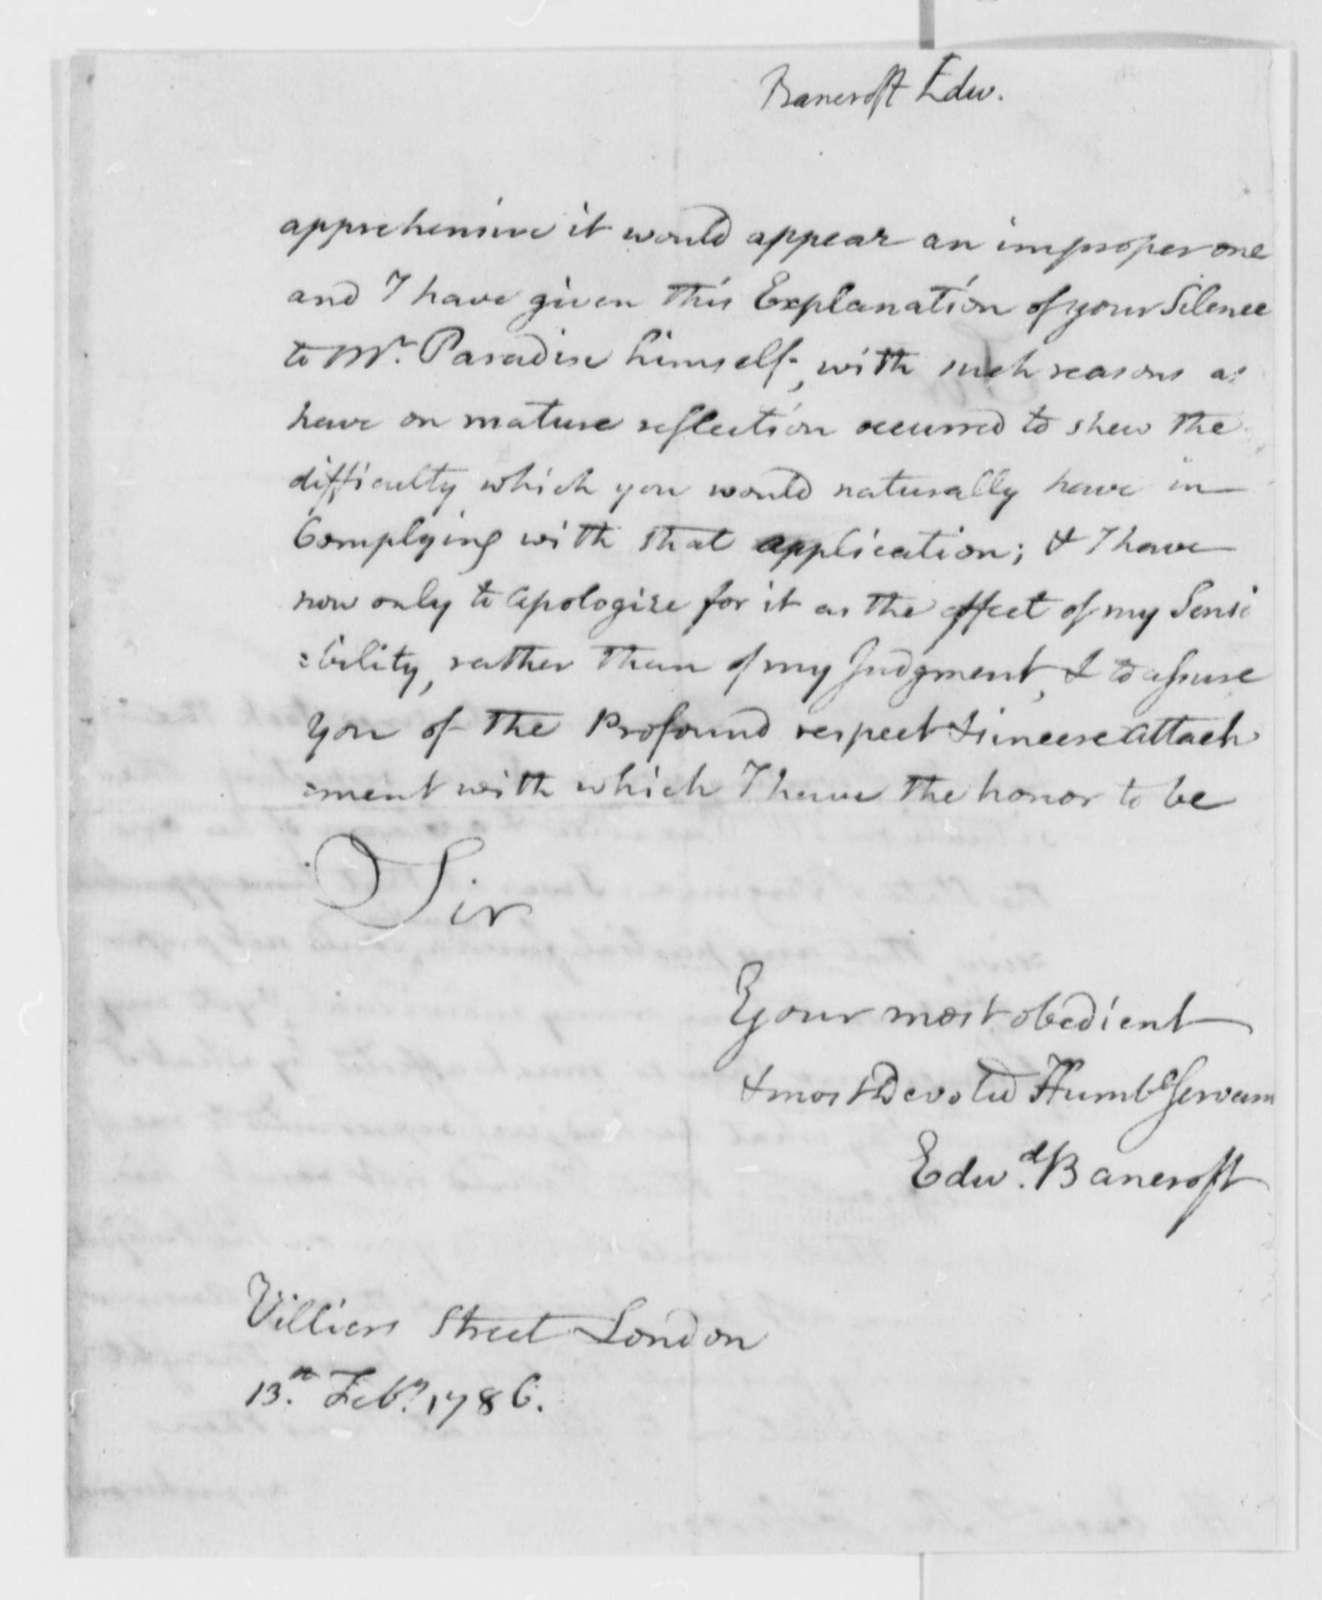 Edward Bancroft to Thomas Jefferson, February 13, 1786